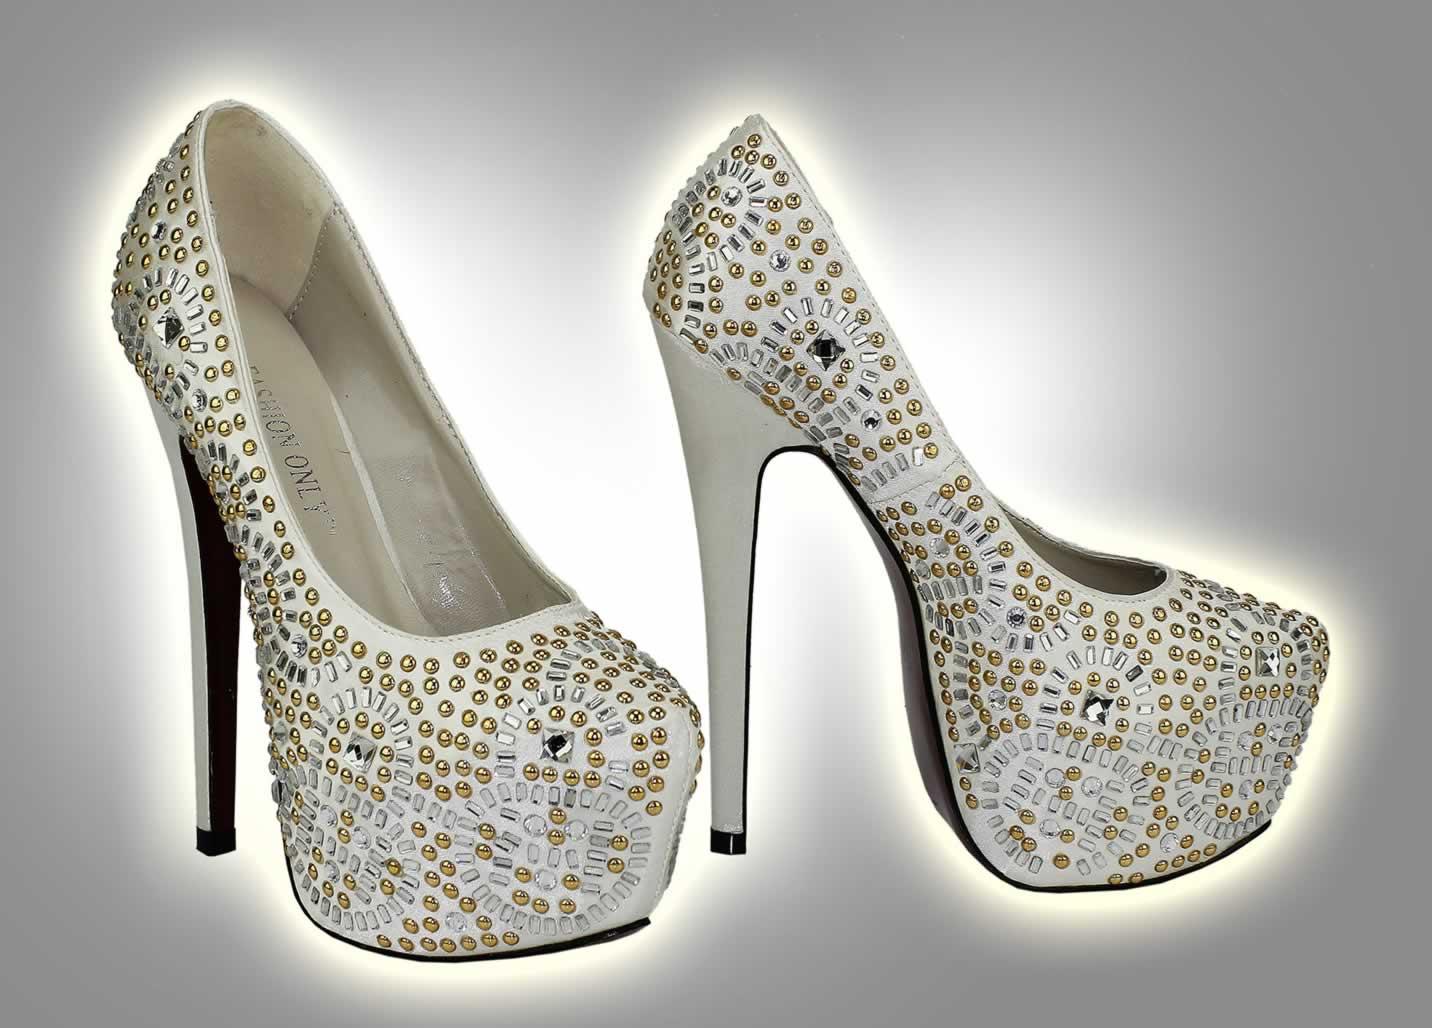 Wholesale Shoes    LSS00117 - Ivory Studded Platform Shoes - Ladies ... 88bae756b8